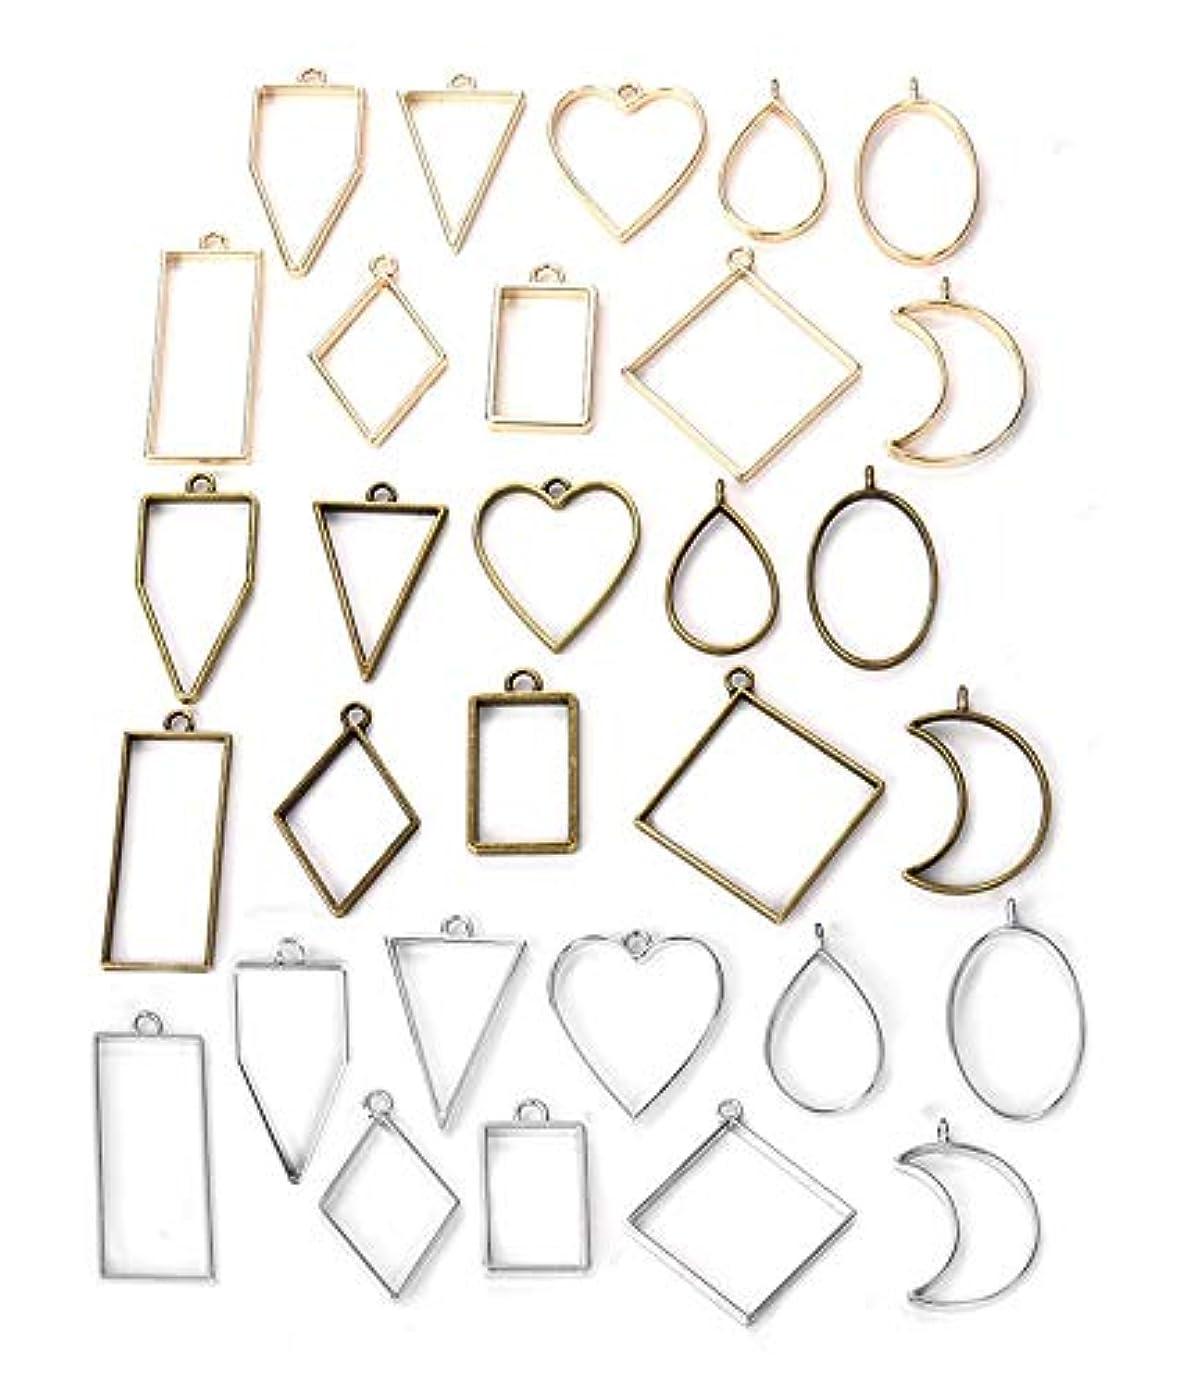 MosBug 30PCS Bezel Charms Pendants Open Back Bezel Pendants Hollow Mold Pendants Assorted Geometric Hollow Pressed Flower Frame Pendant DIY Crafts for Resin Earrings Necklace Bracelet